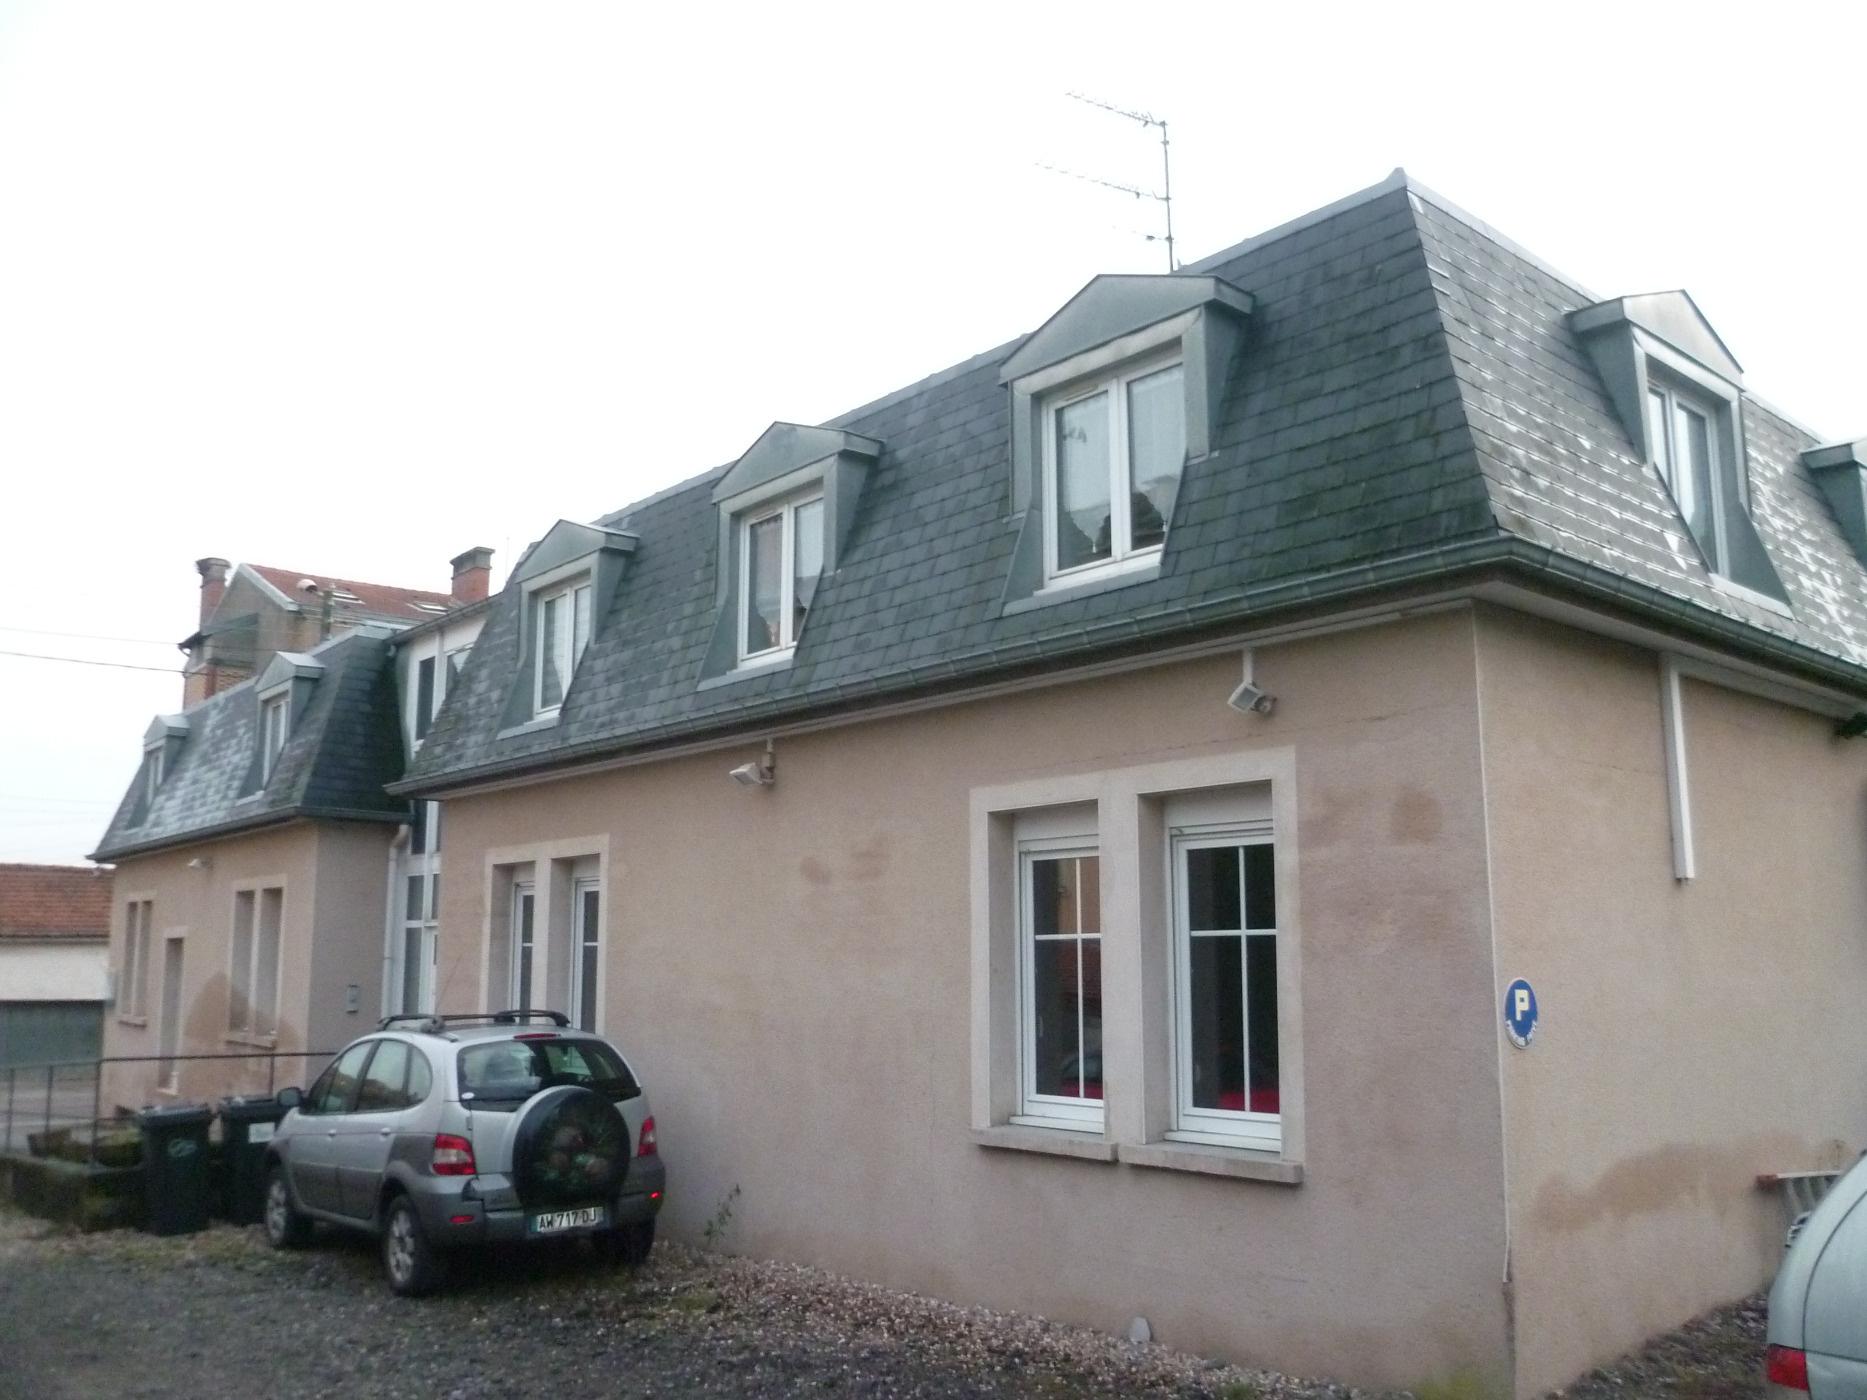 Sarl bouko immobilier exclusivit immobili re - Bouko immobilier saint nicolas de port ...